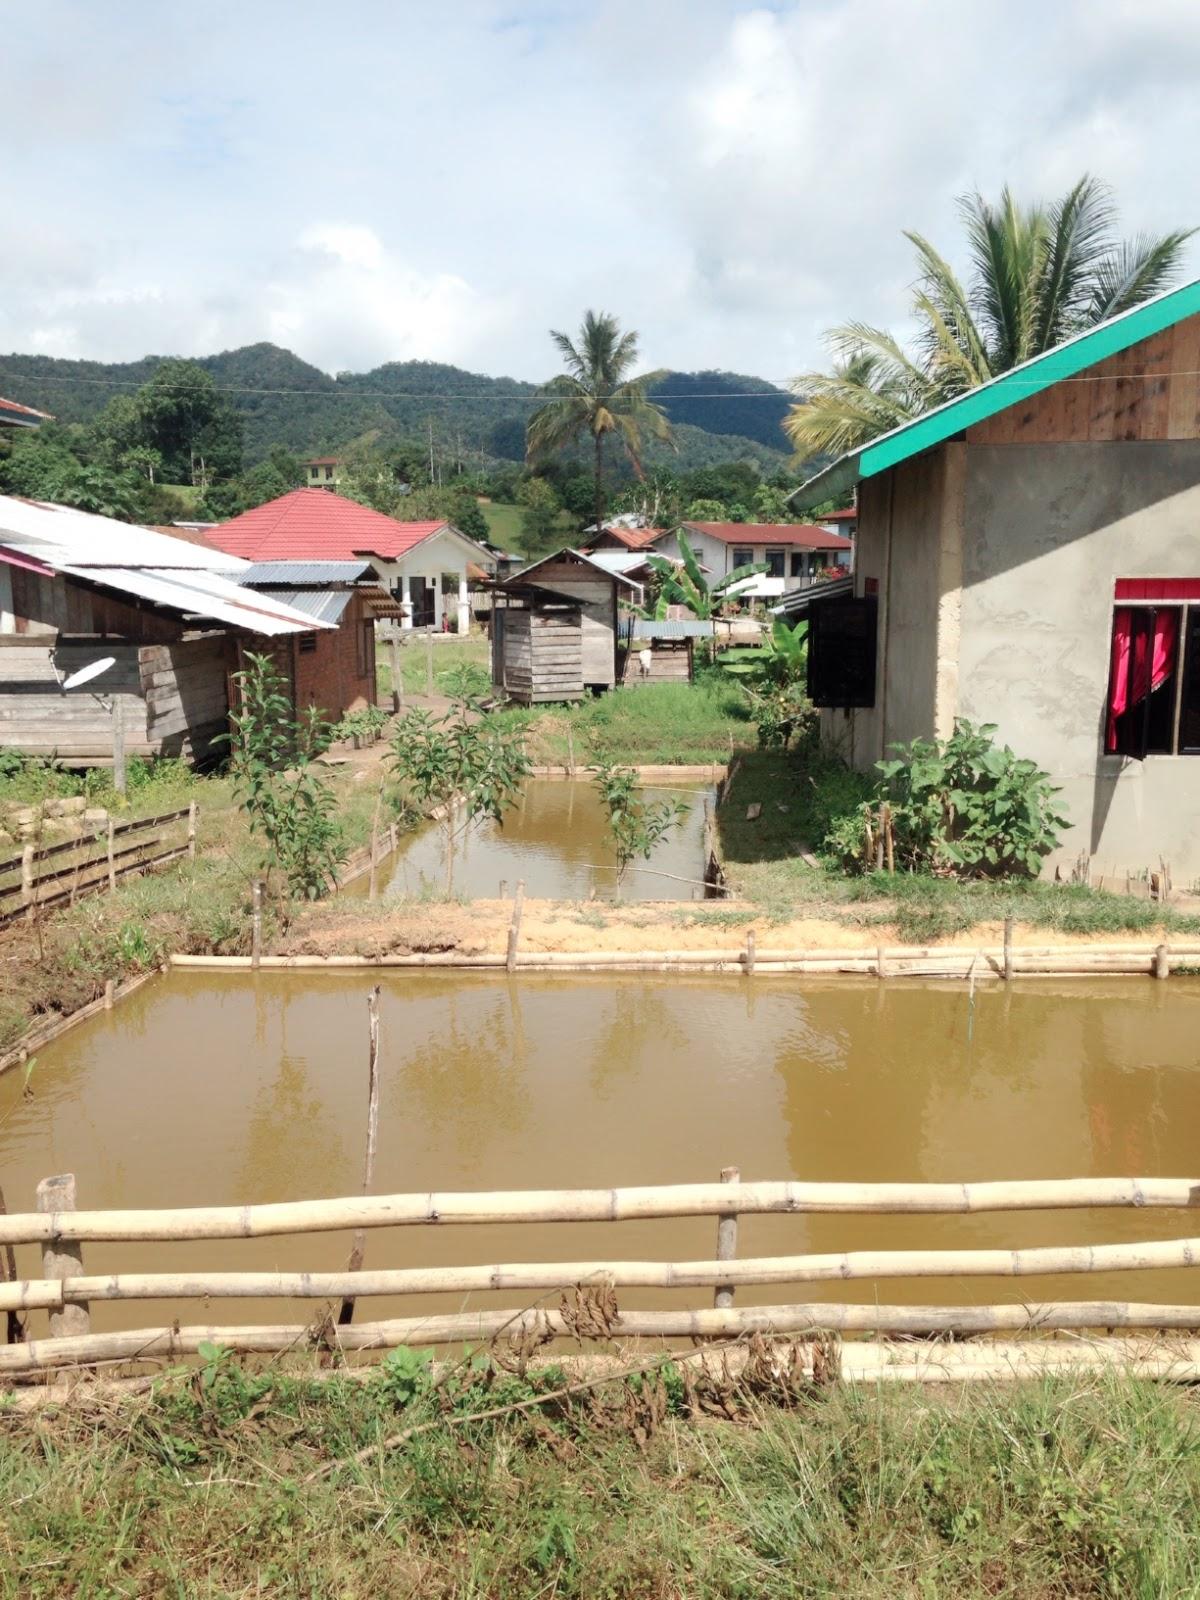 Dokumentasi Kunjungan Lapangan Kegiatan Kampung Sejahtera Long Kolam Budidaya Ikan